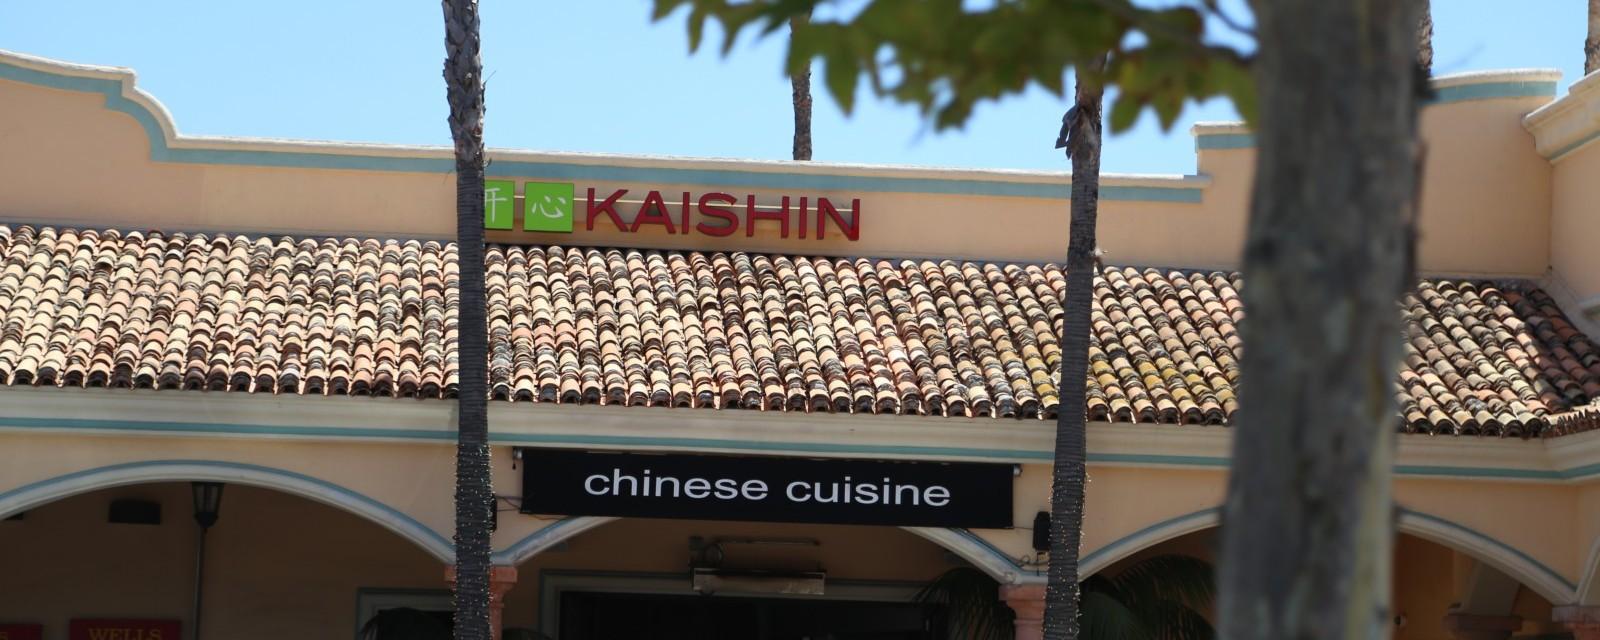 kaishin-malibu-restaurant_all-things-malibu